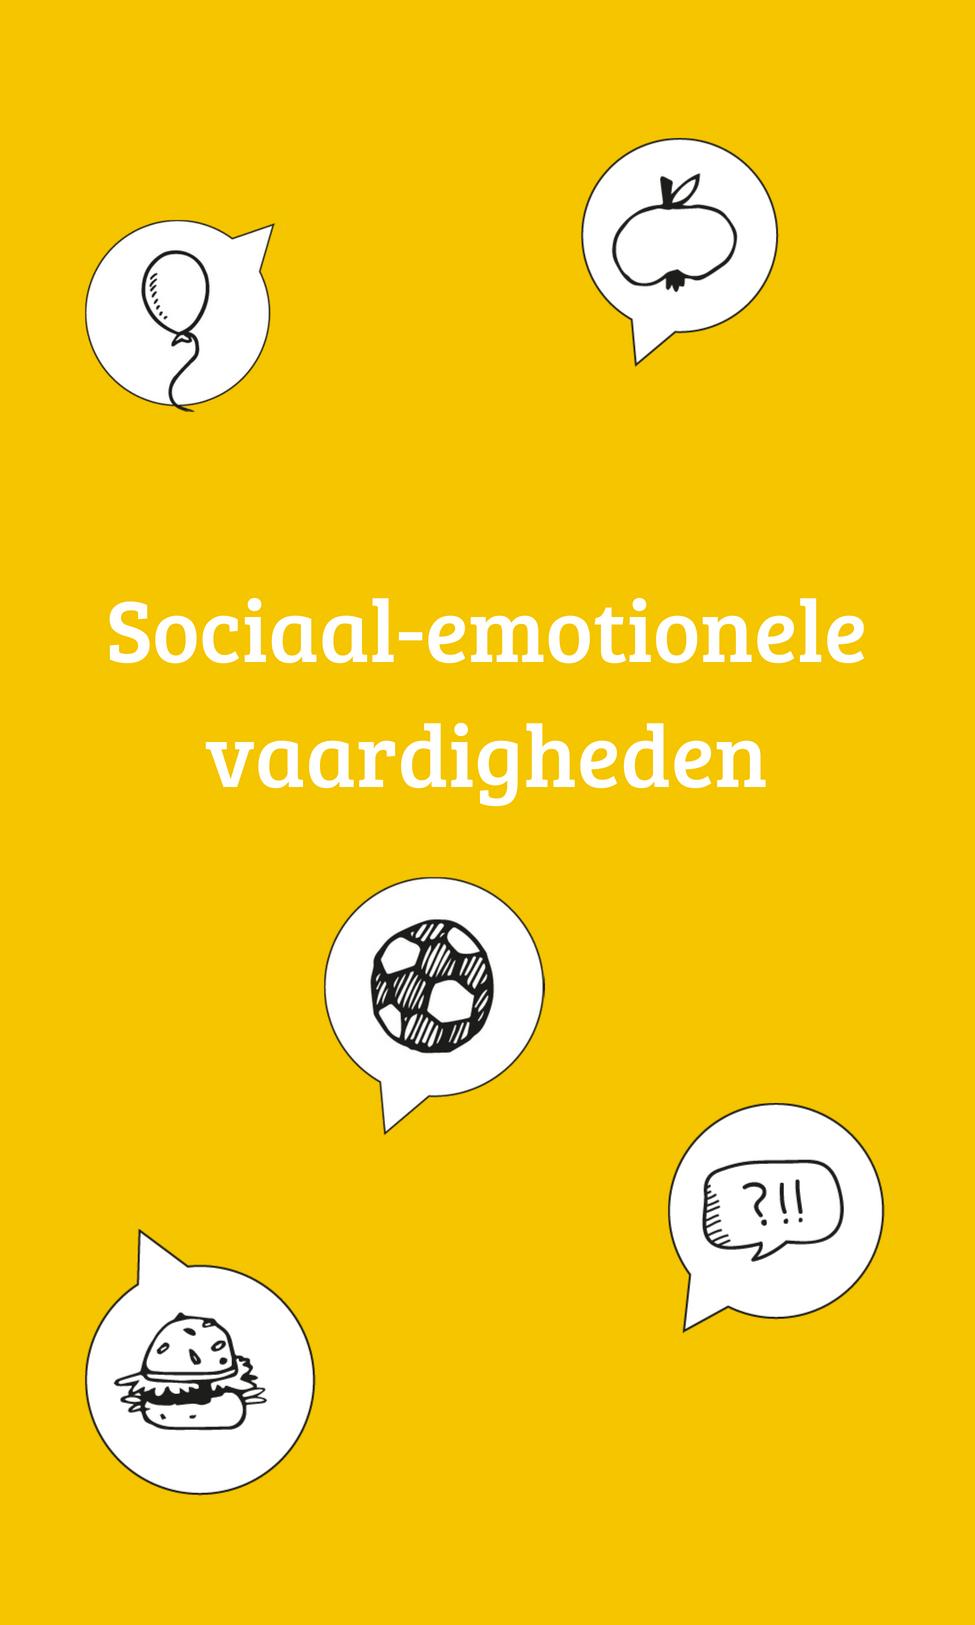 Sociaal-emotionele vaardigheden